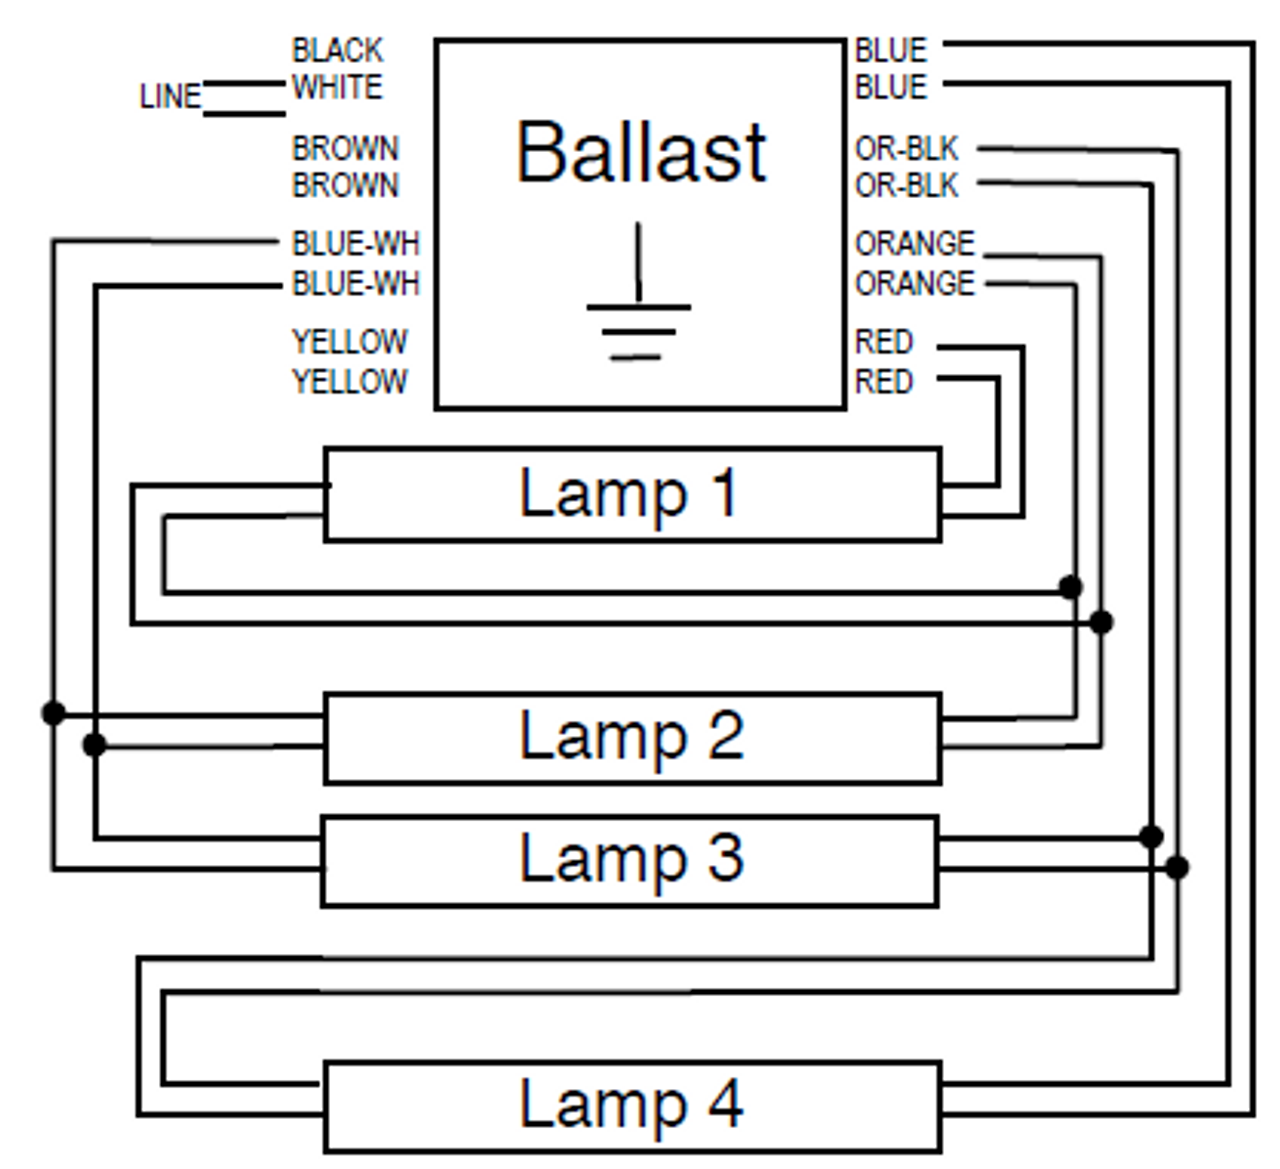 KTSB-2448-46-1-TP Keystone Magnetic Sign Ballast on 2 bulb ballast diagram, keystone fluorescent light ballast, fluorescent lamp wiring diagram, keystone trailer wiring diagram,